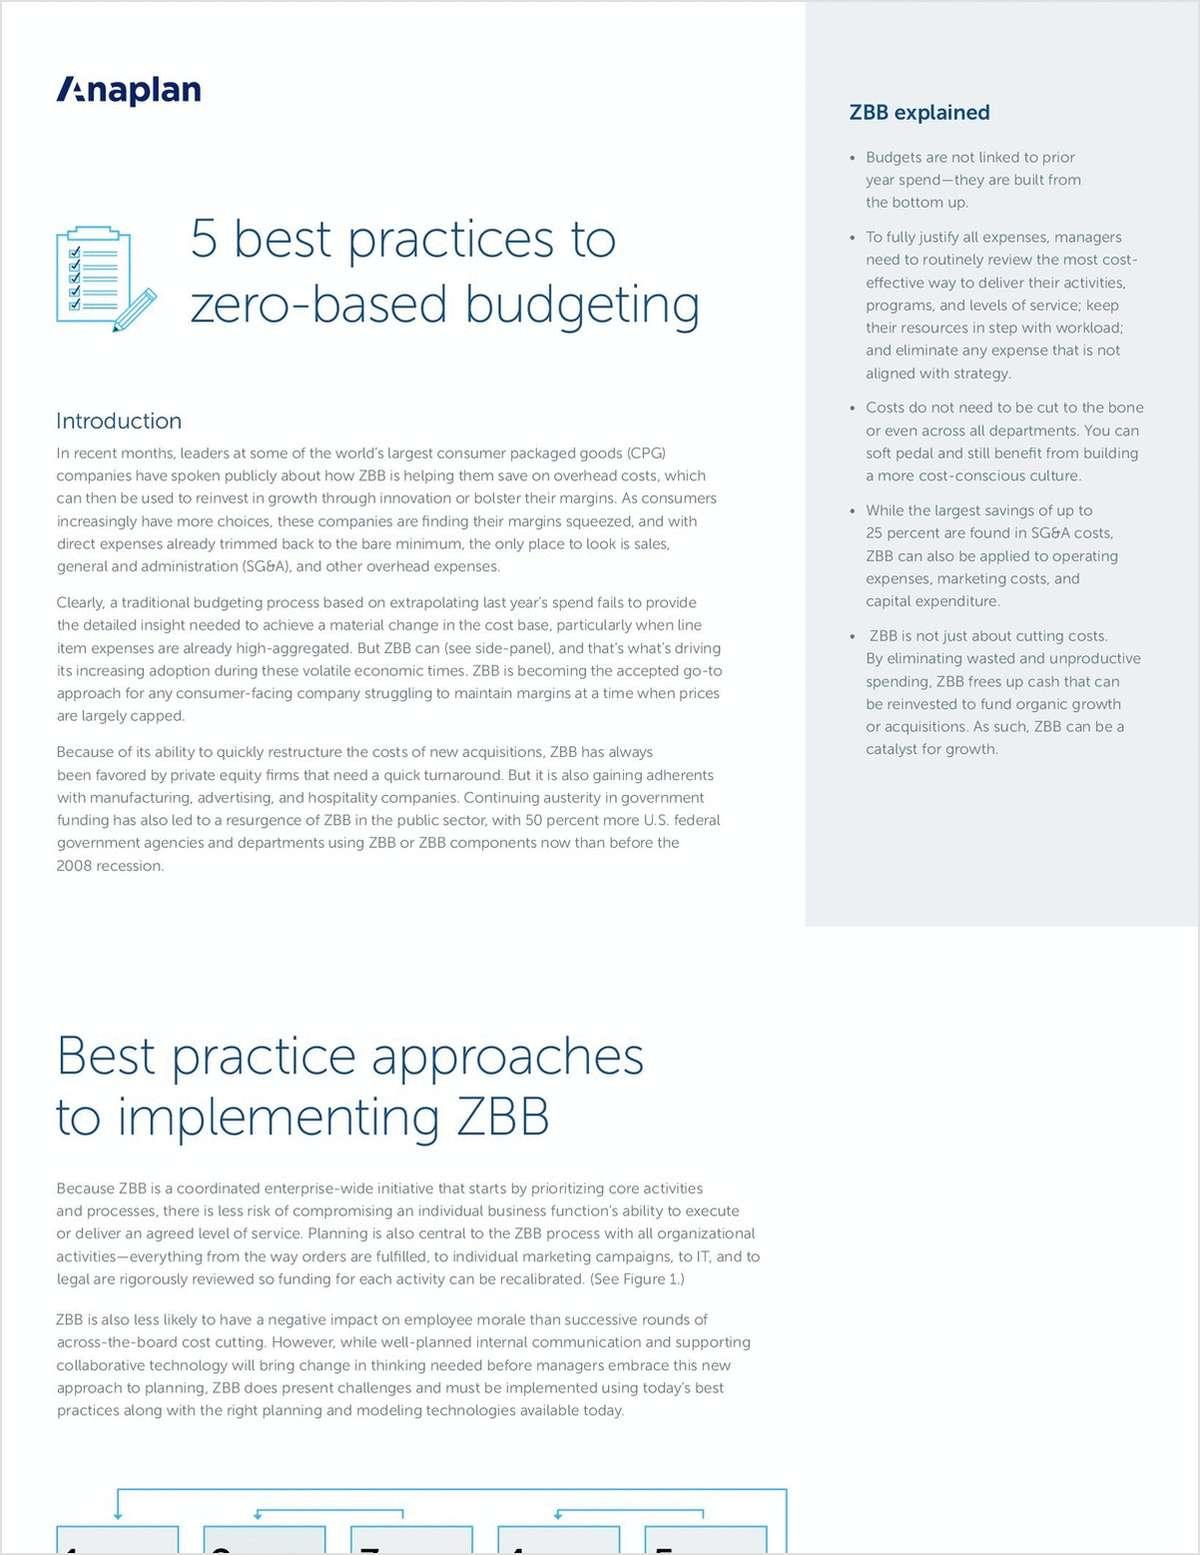 5 Best Practices to ZBB